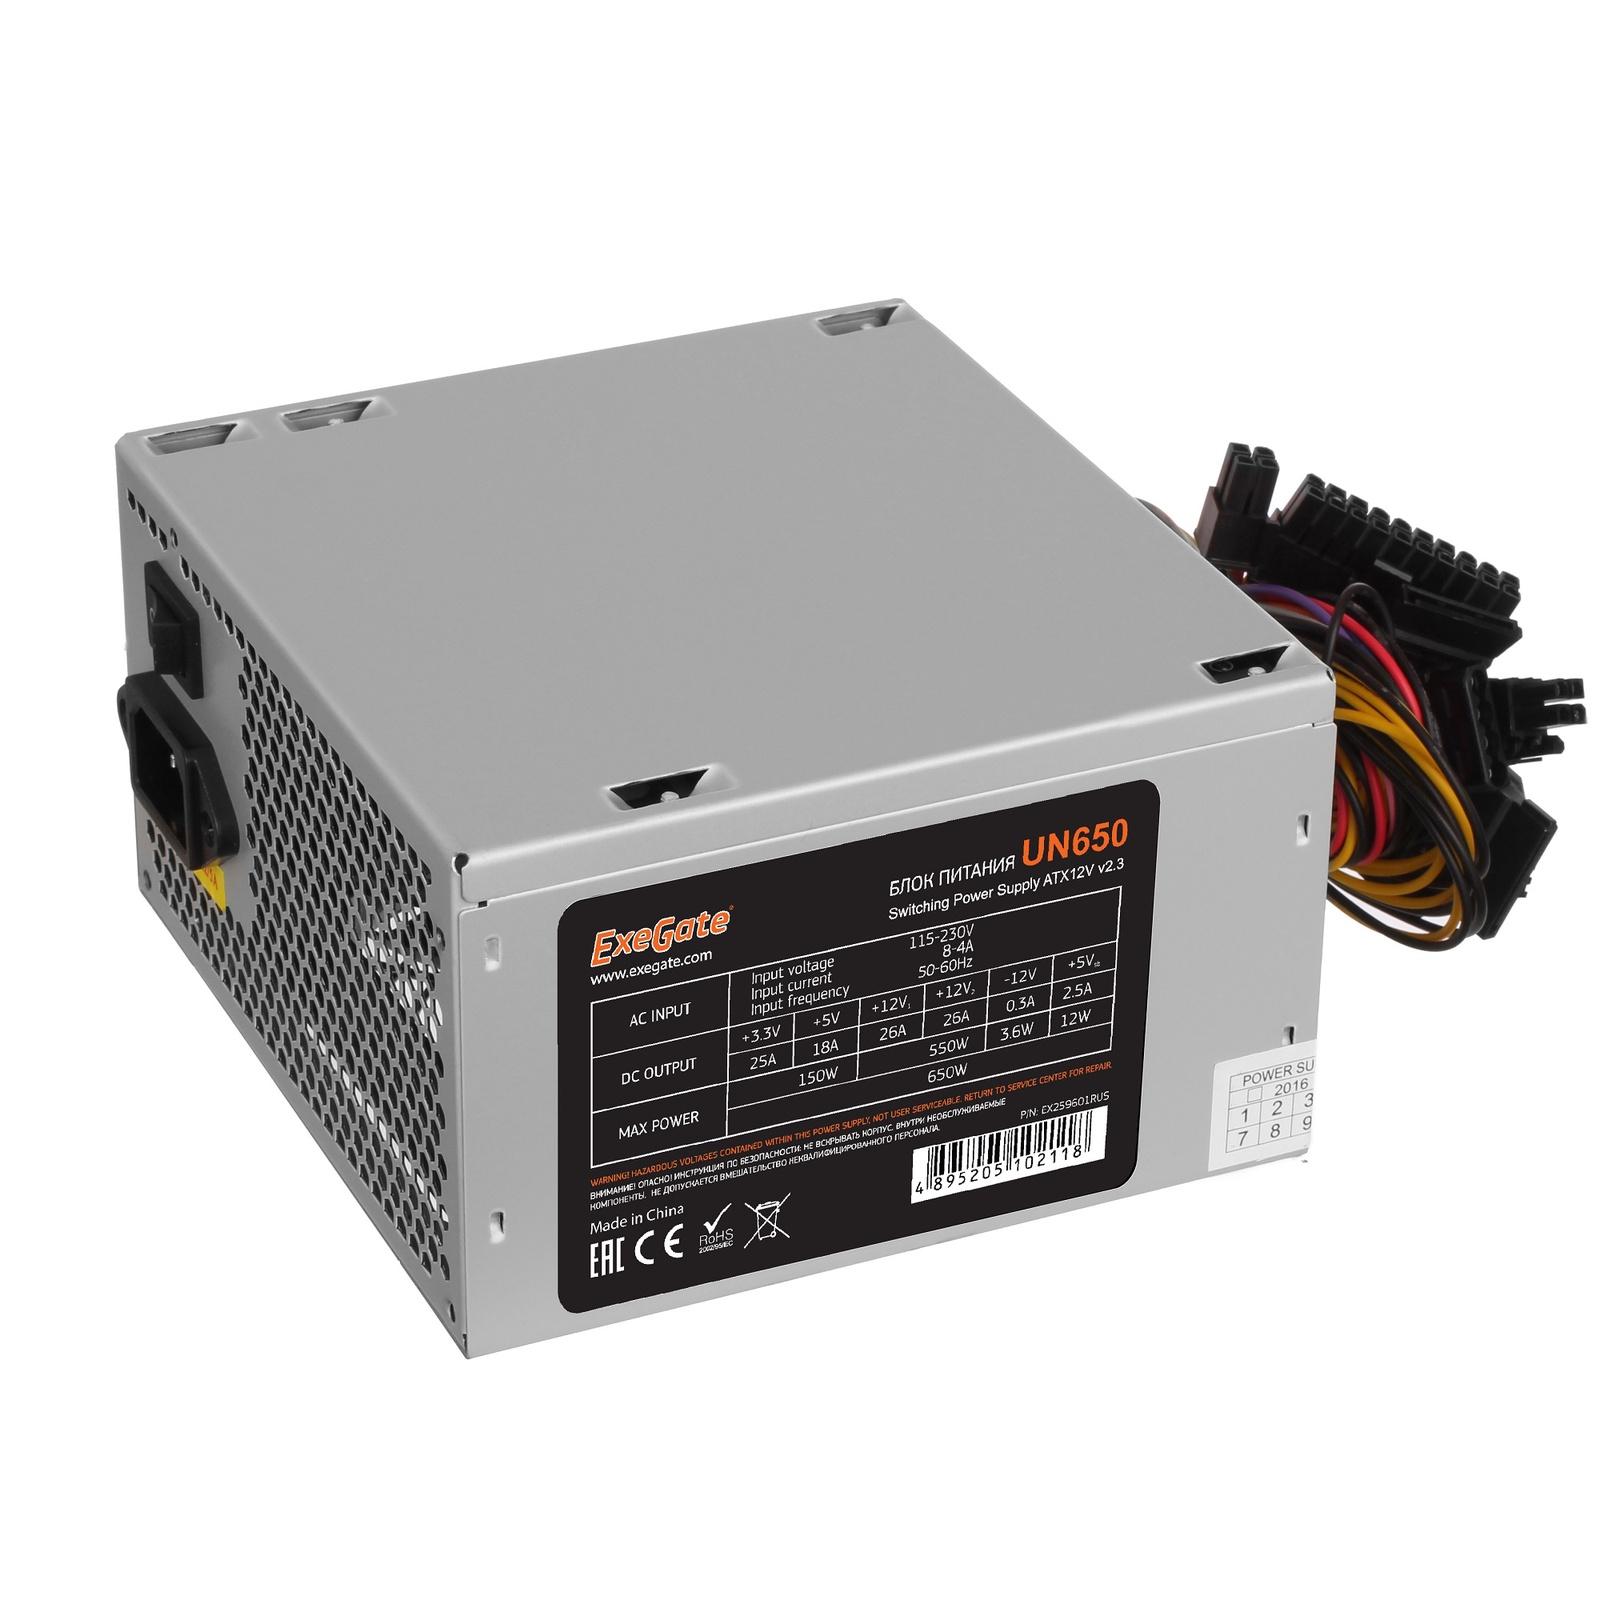 Блок питания 650W Exegate UN650, ATX, 12cm fan, 24p+4p, 6/8p PCI-E, 3*SATA, 2*IDE, FDD